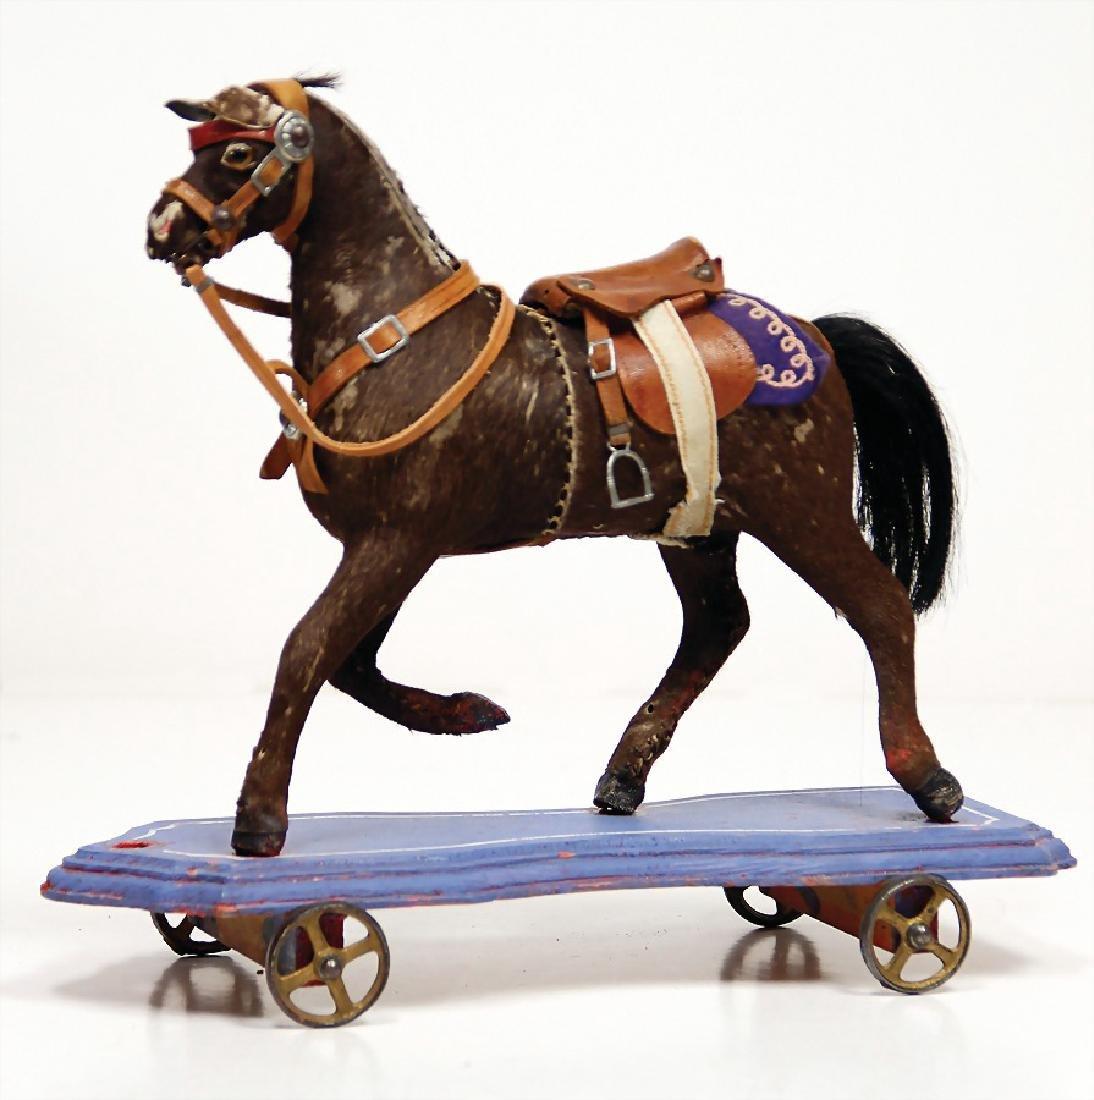 early draft horse, pelt covered, original saddle,